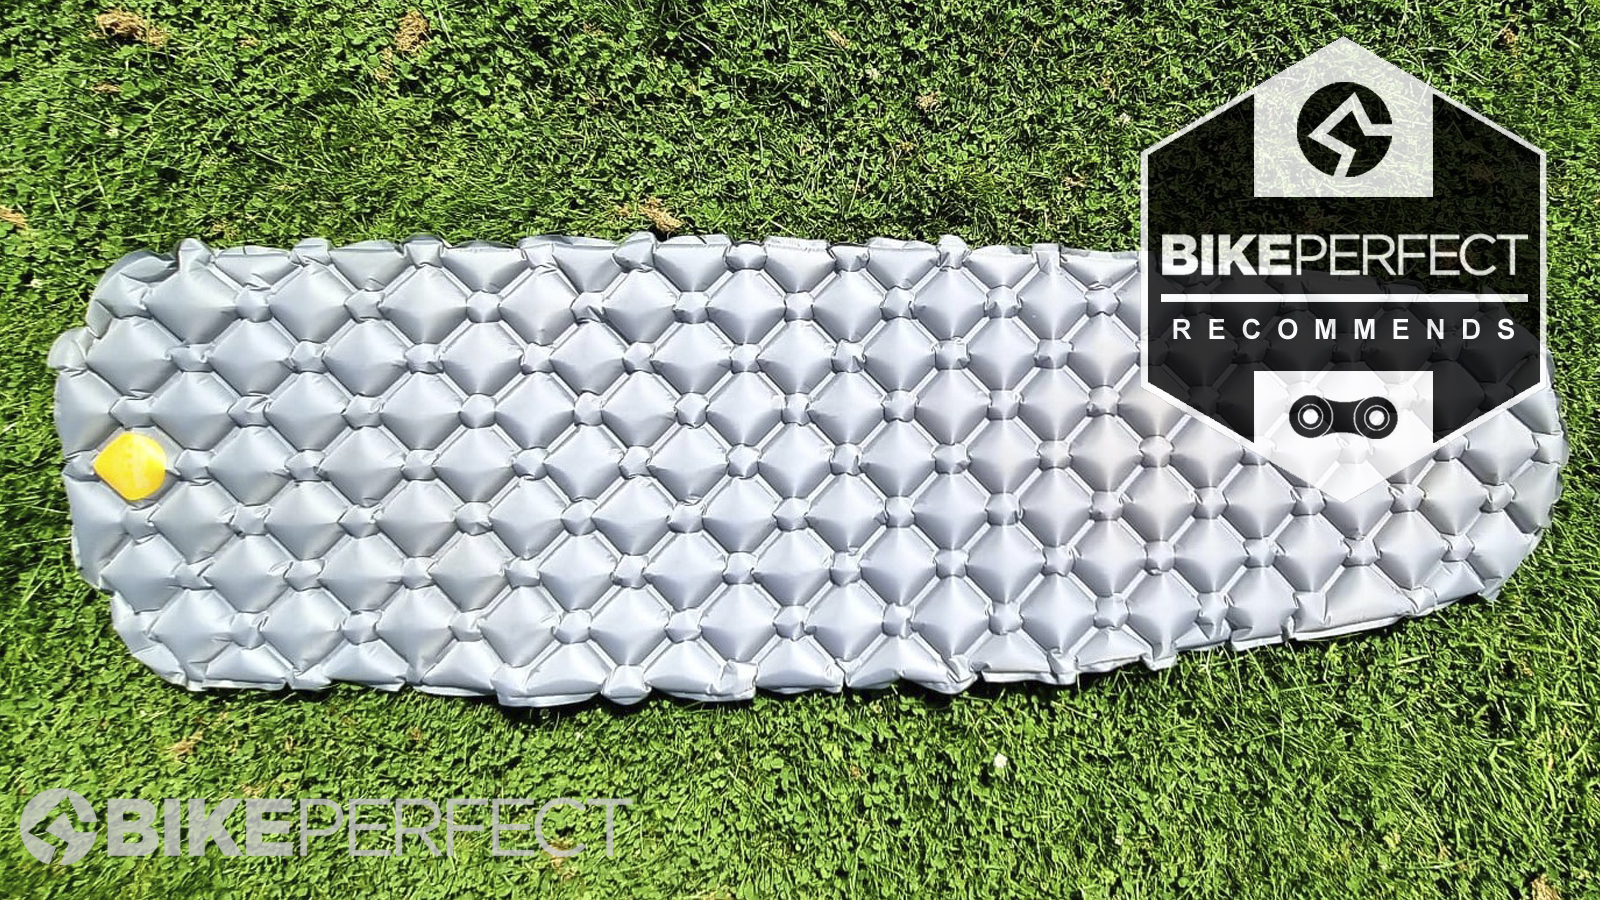 Alpkit Cloud Base inflatable sleeping mat review